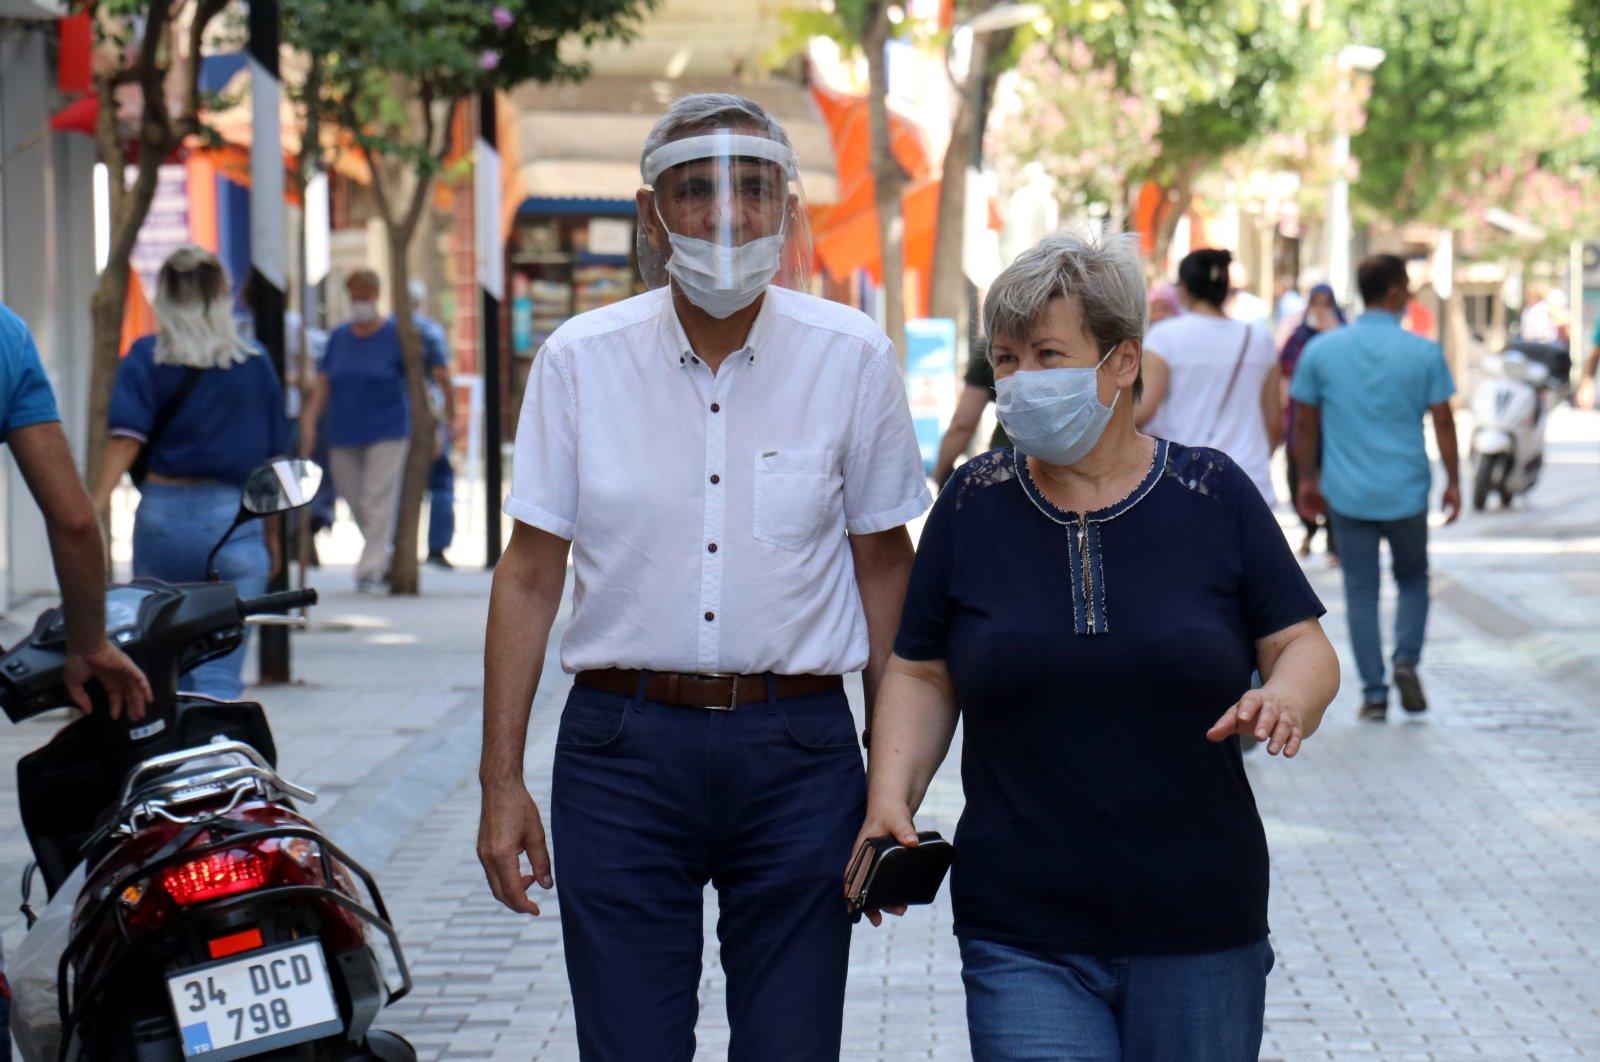 A man and a woman wearing protective masks walk on a street in Kırklareli, northwestern Turkey, Aug. 14, 2020. (AA Photo)